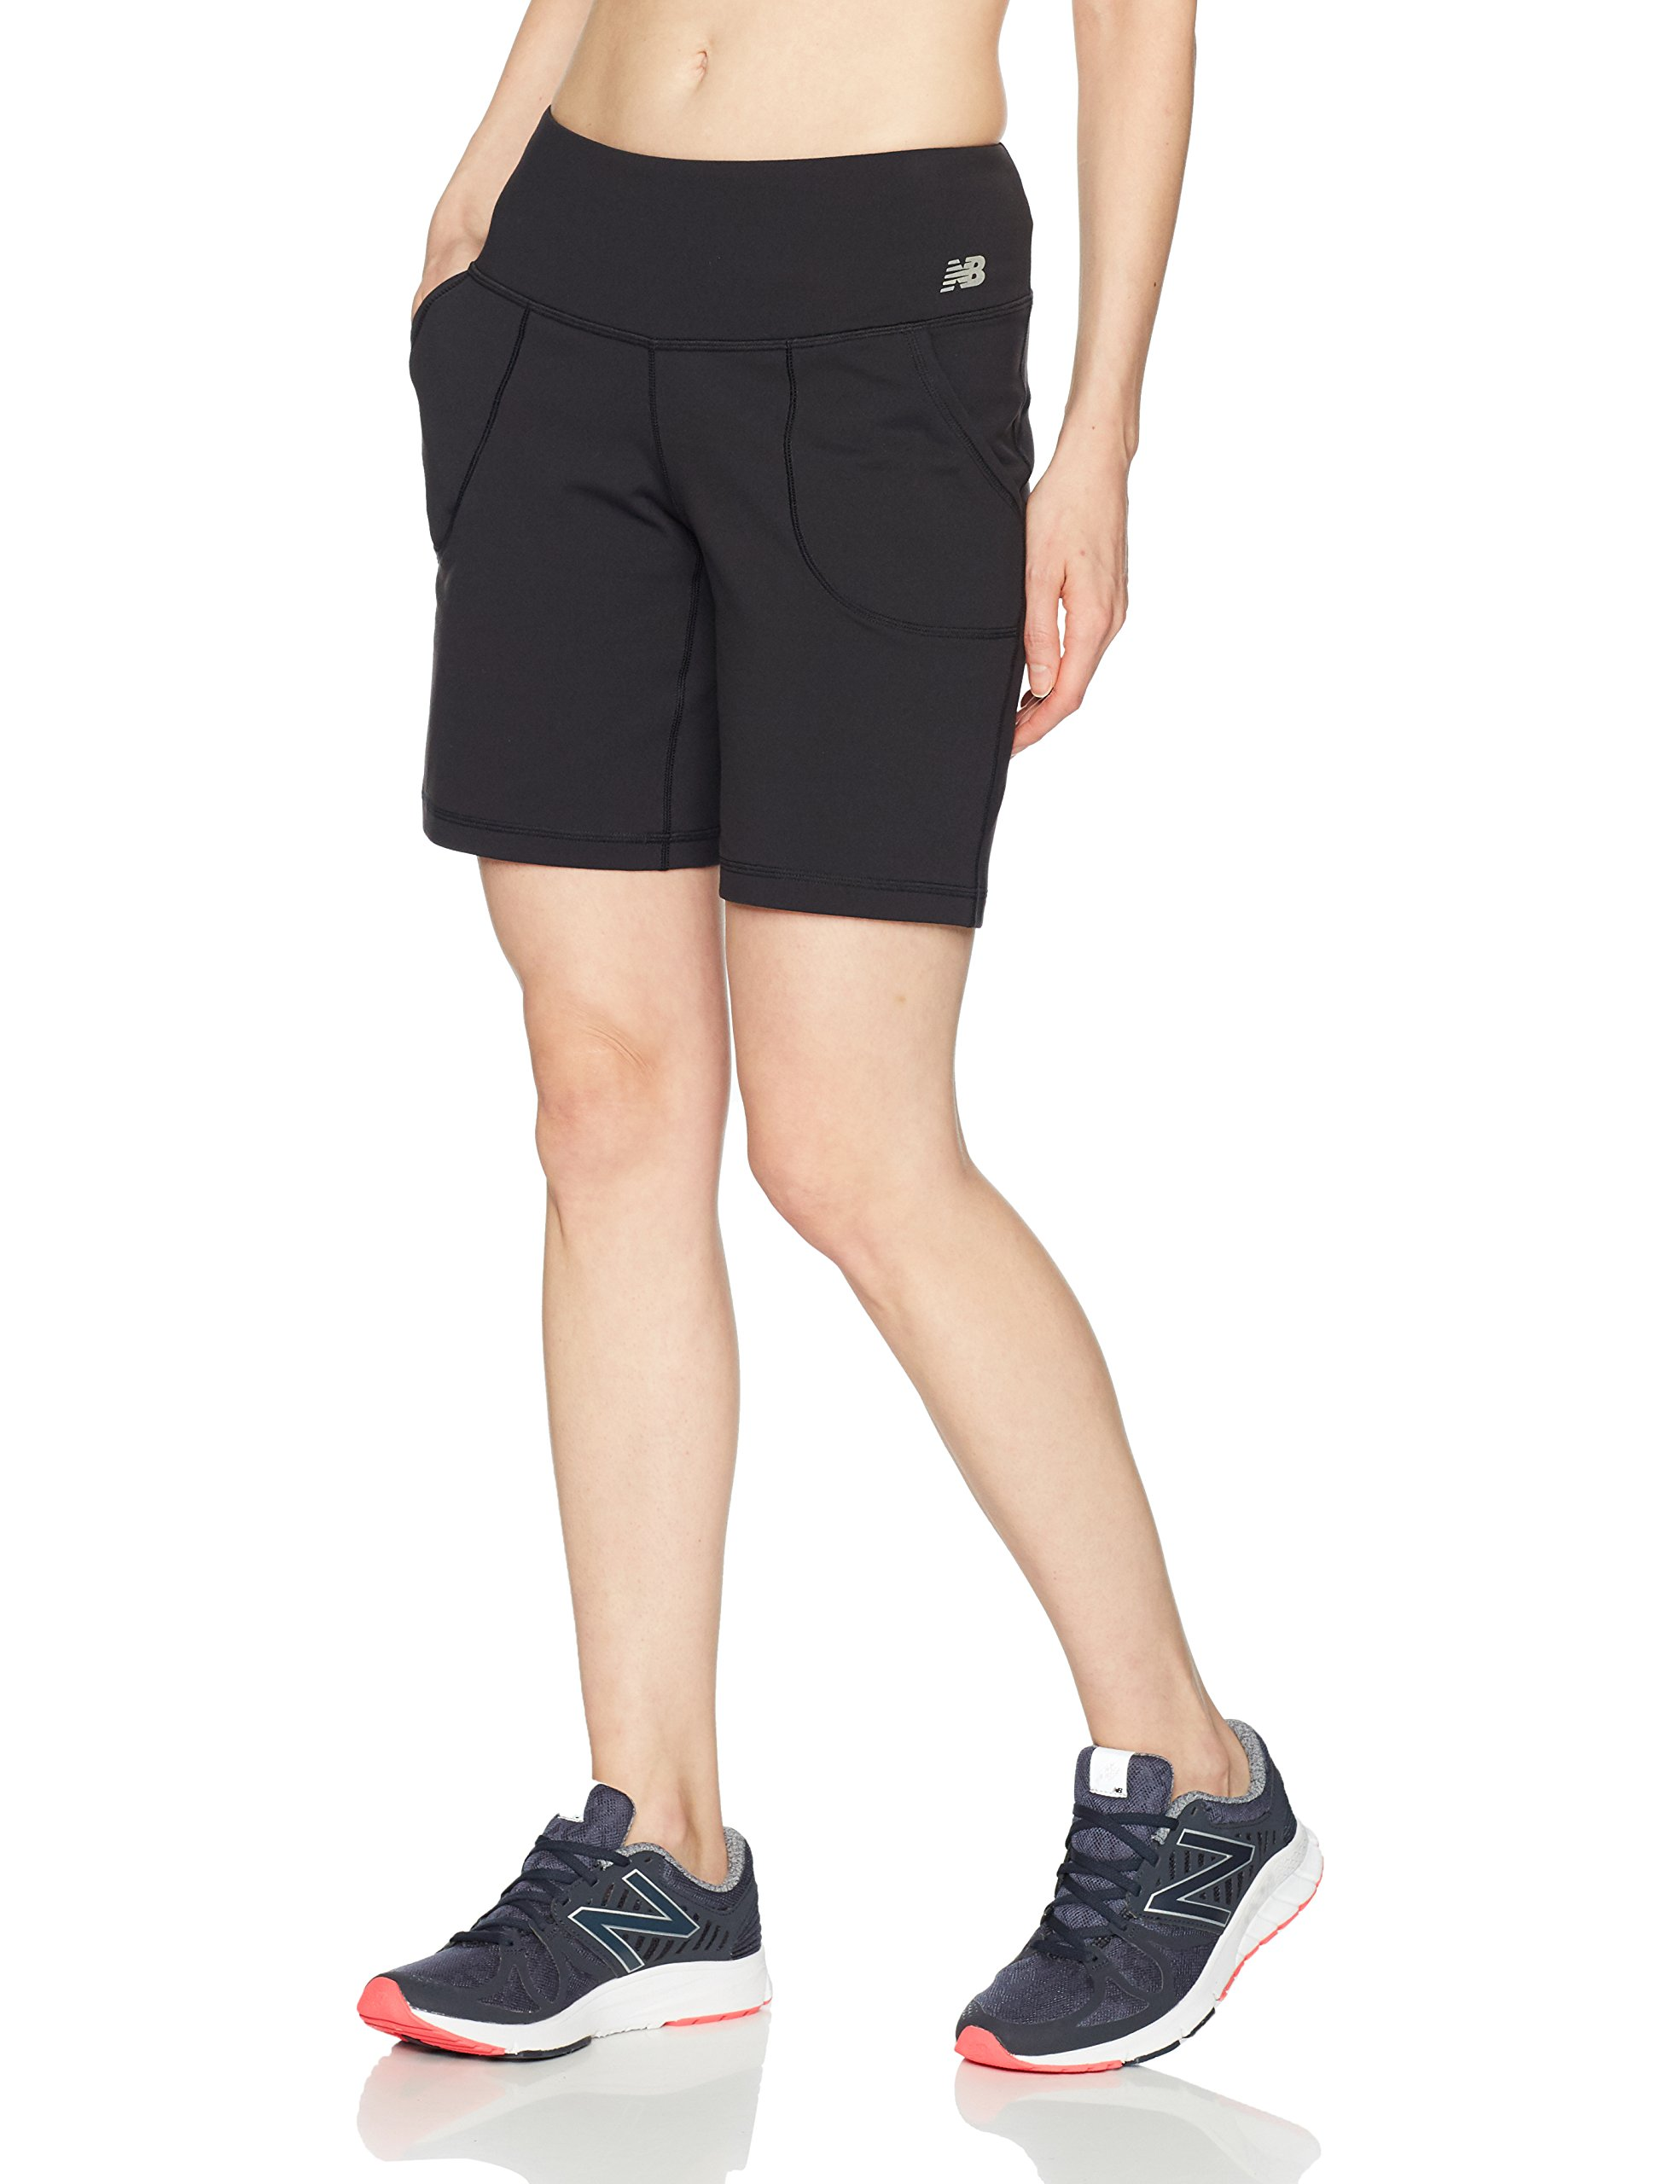 New Balance Women's Premium Performance 8-Inch Shorts, Black, X-Small by New Balance